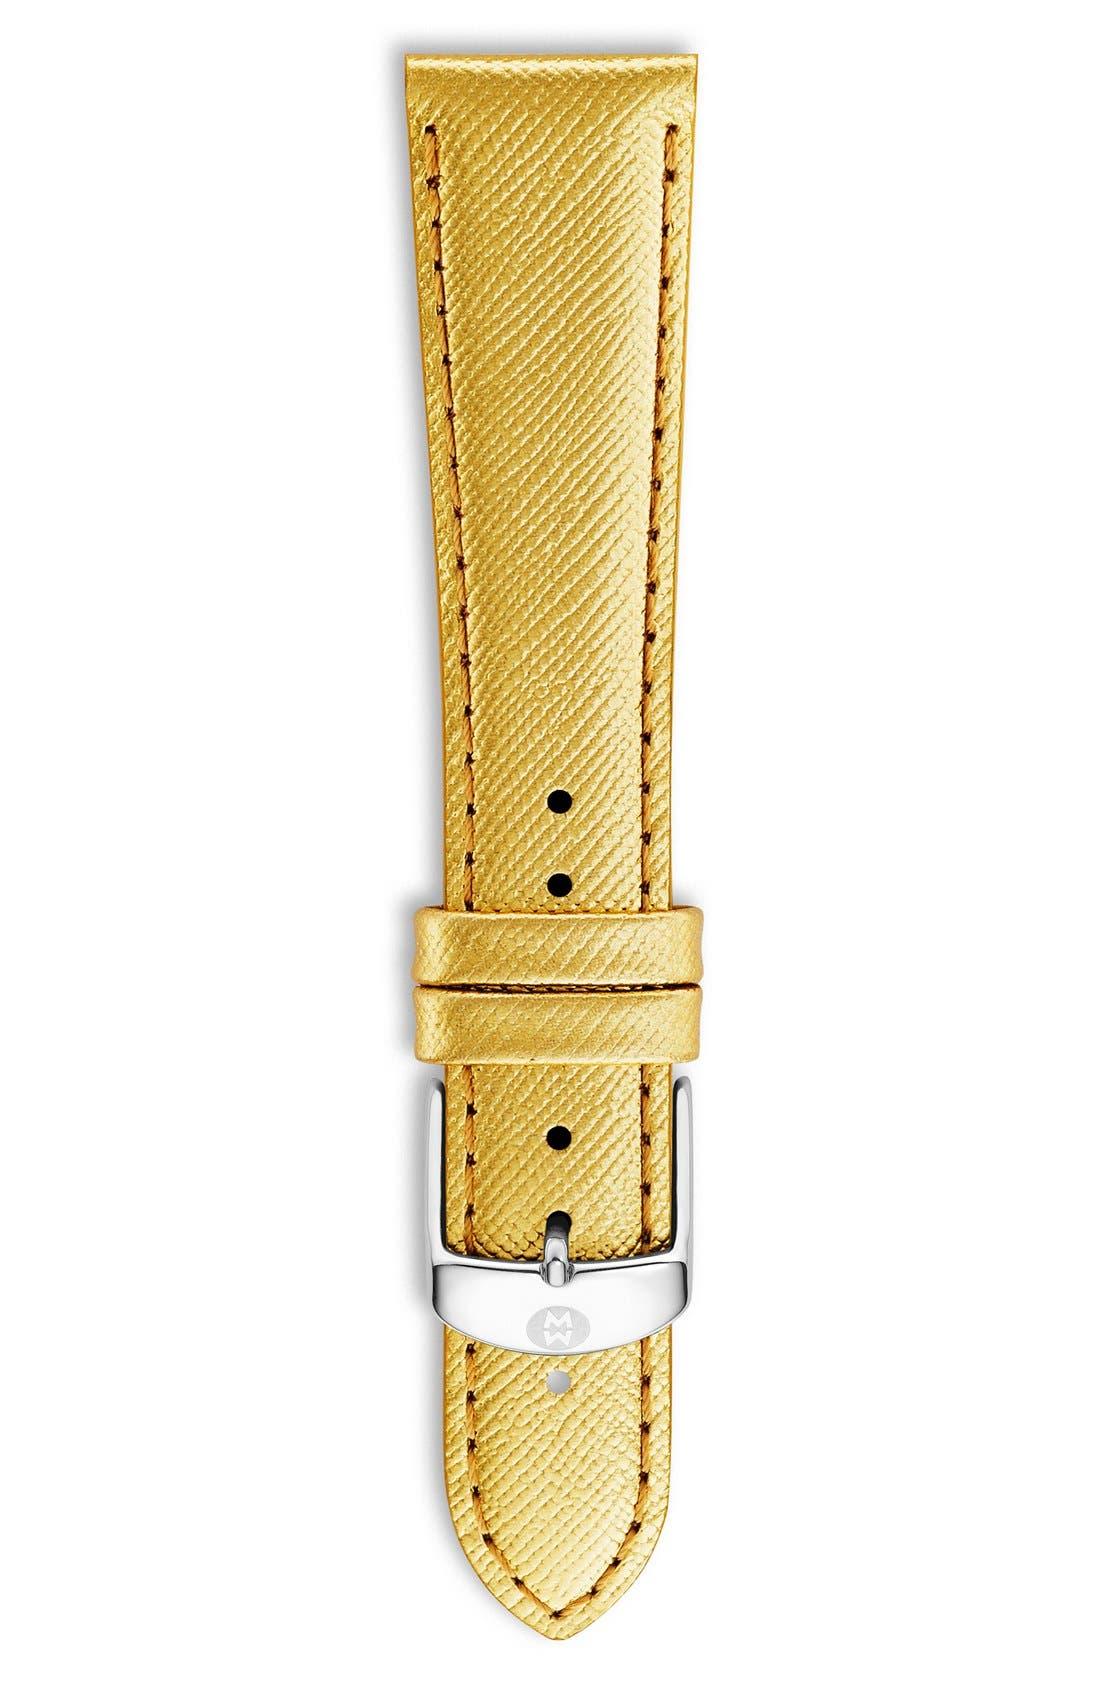 MICHELE 20mm Metallic Leather Watch Strap